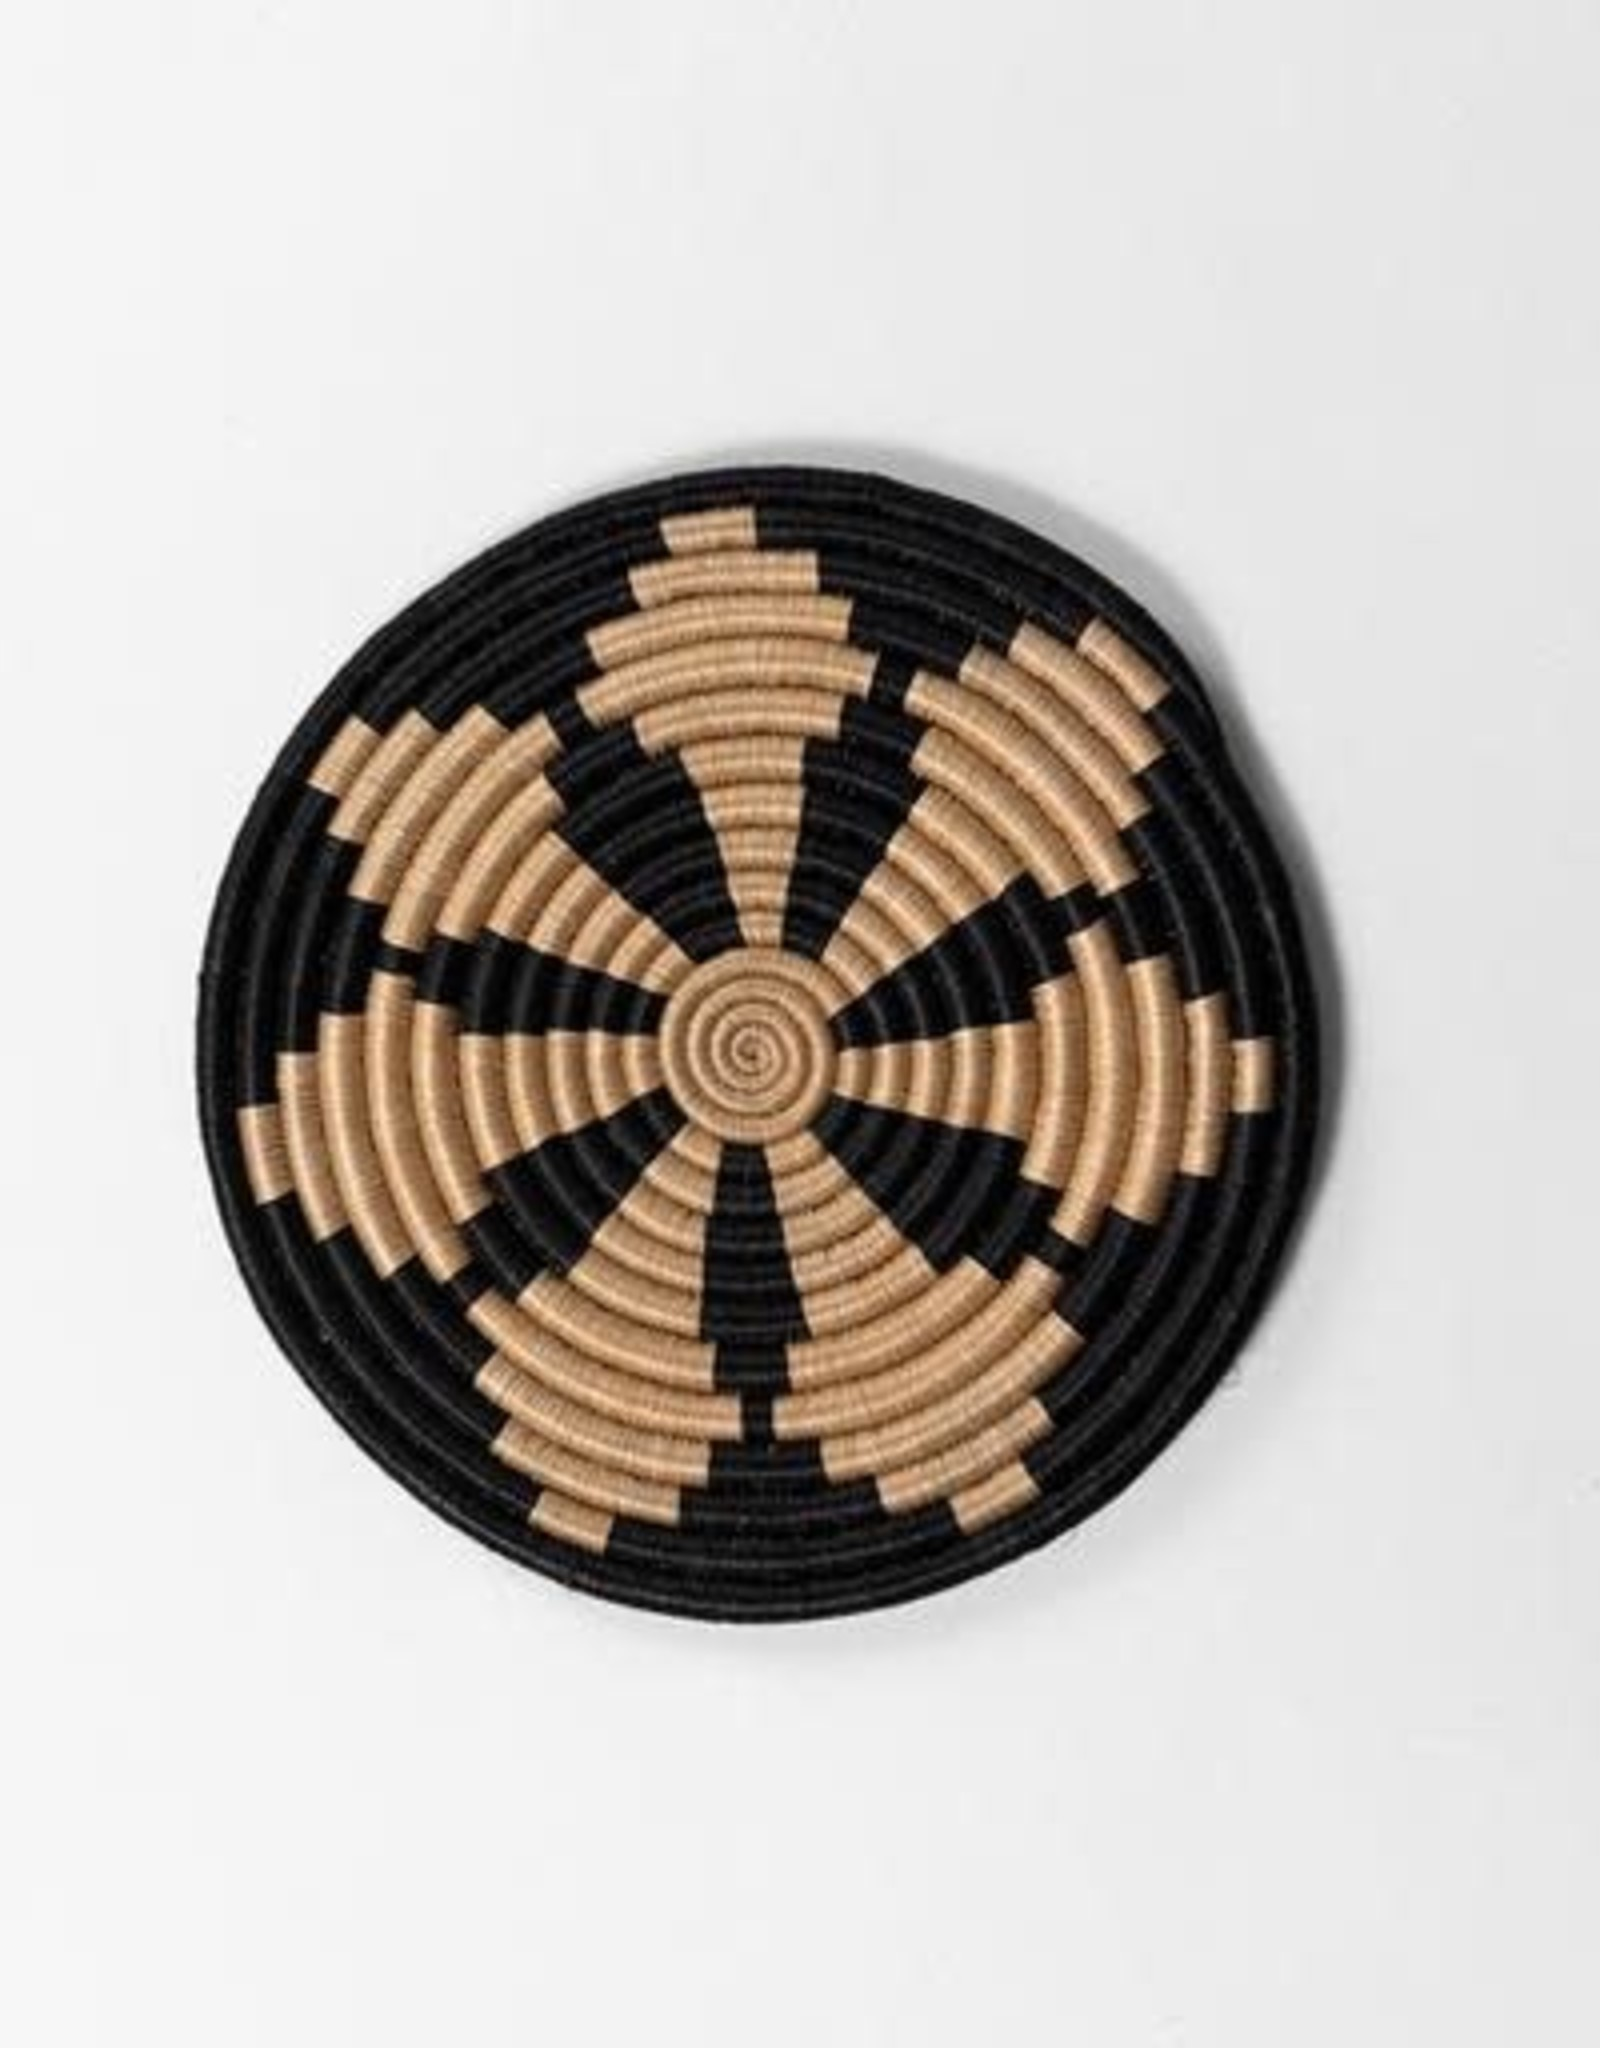 Soko Home Hand Woven Trivet- Round Table - Rwanda